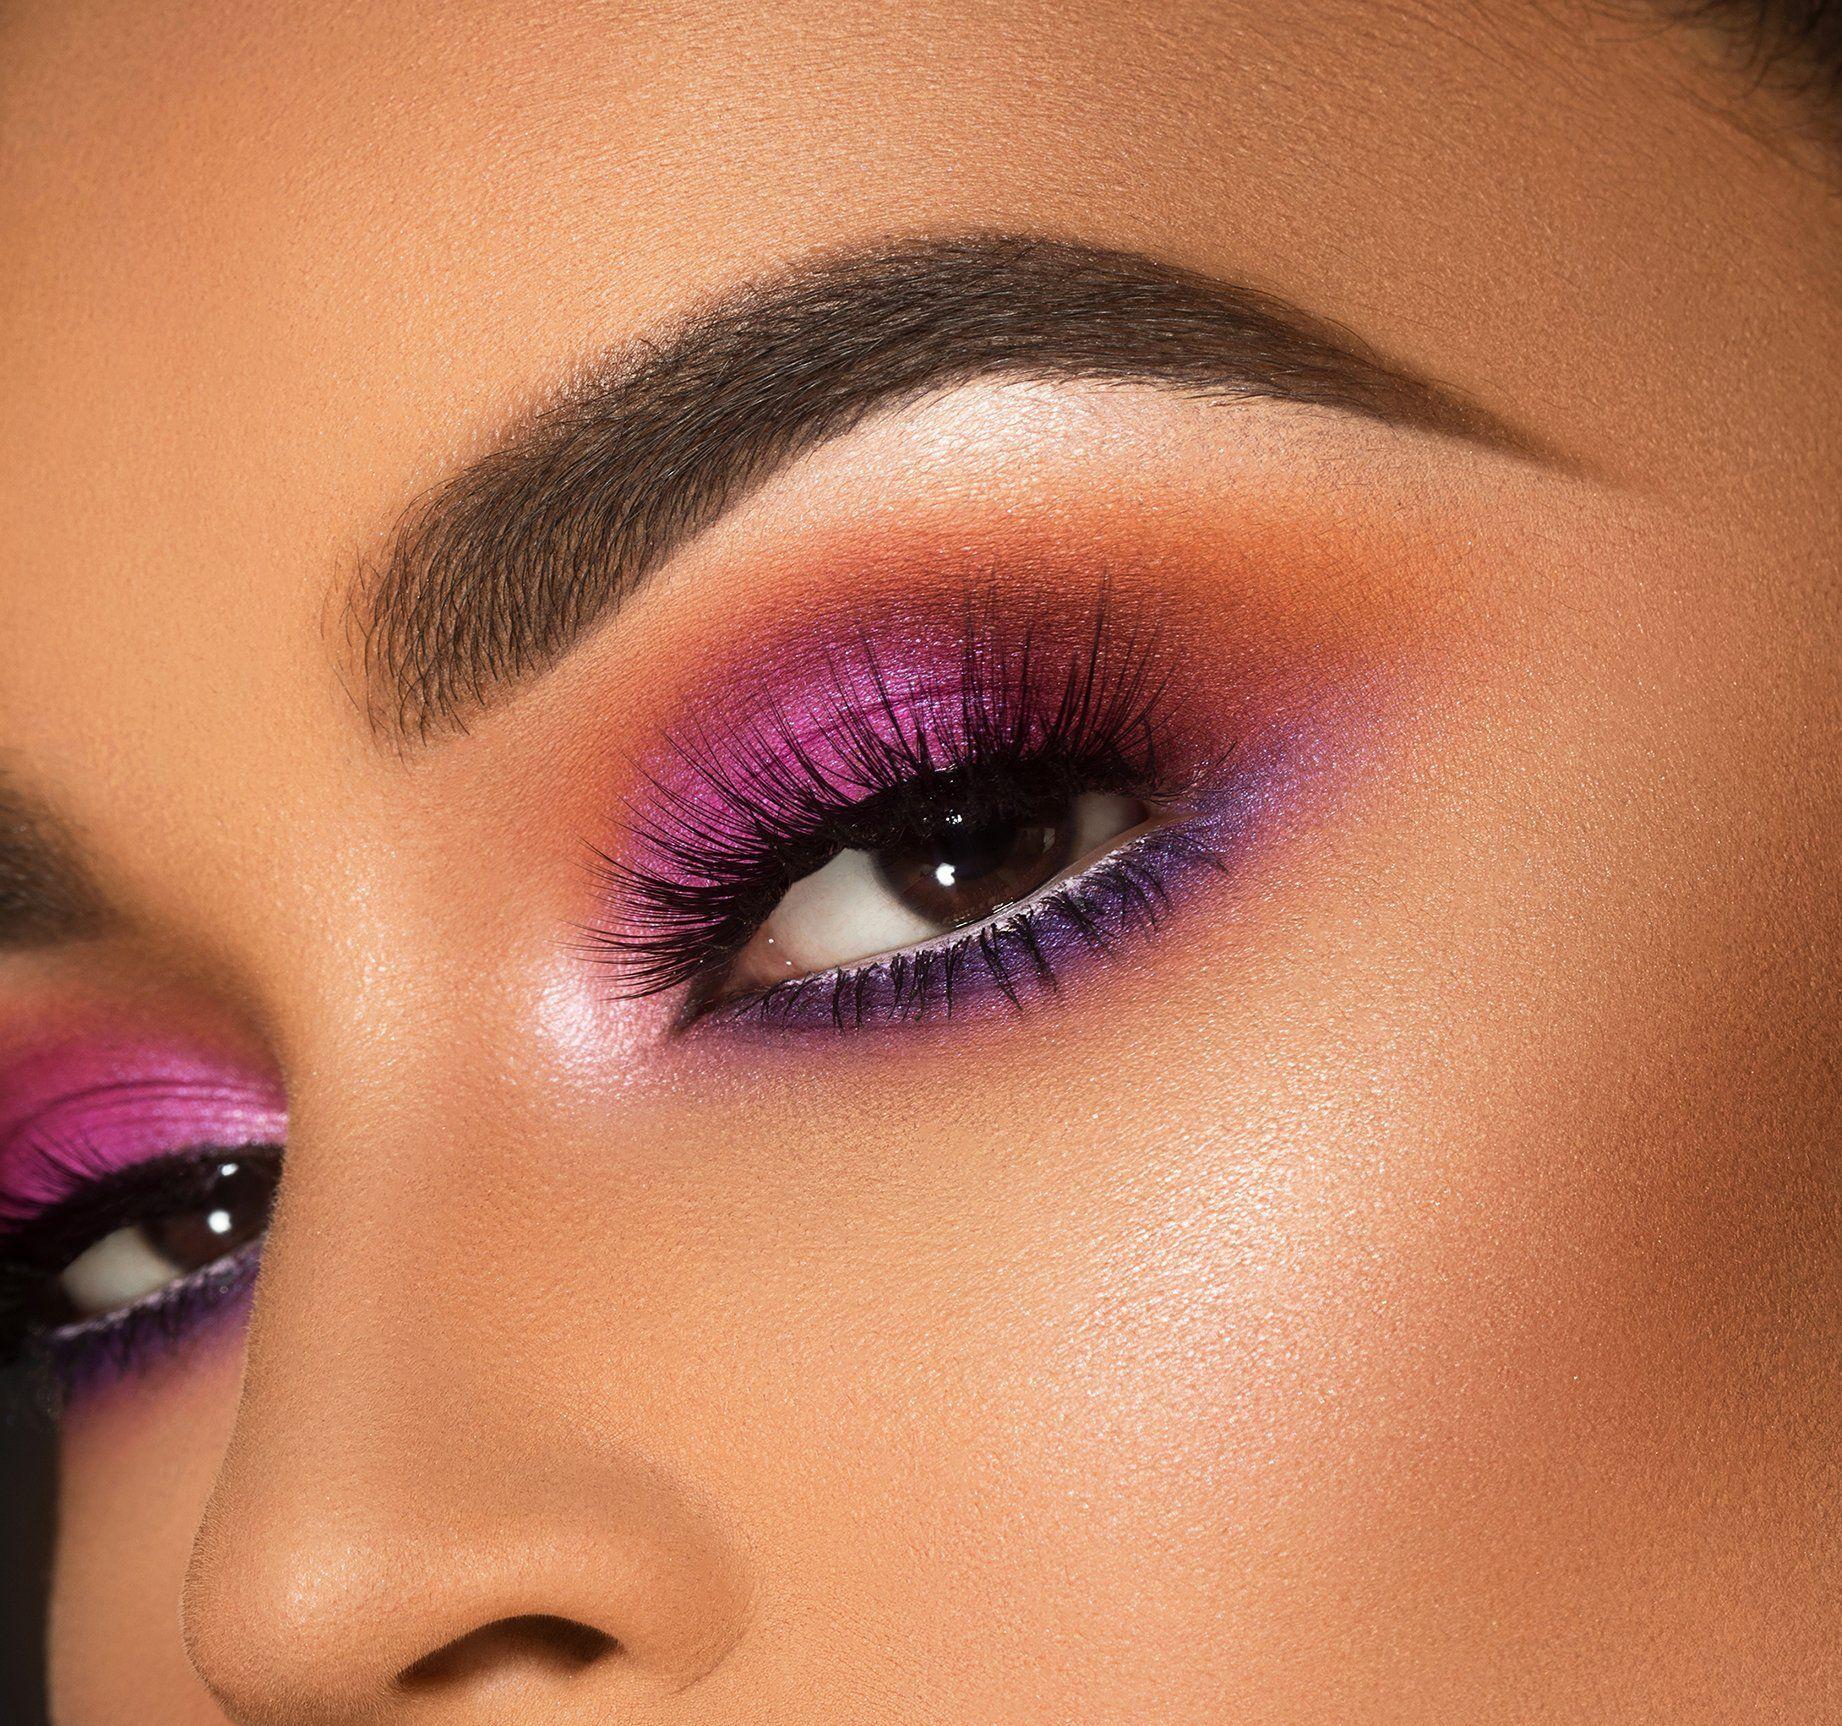 15s Social Butterfly Artistry Palette Butterfly Makeup Makeup Morphe Blue Eye Makeup